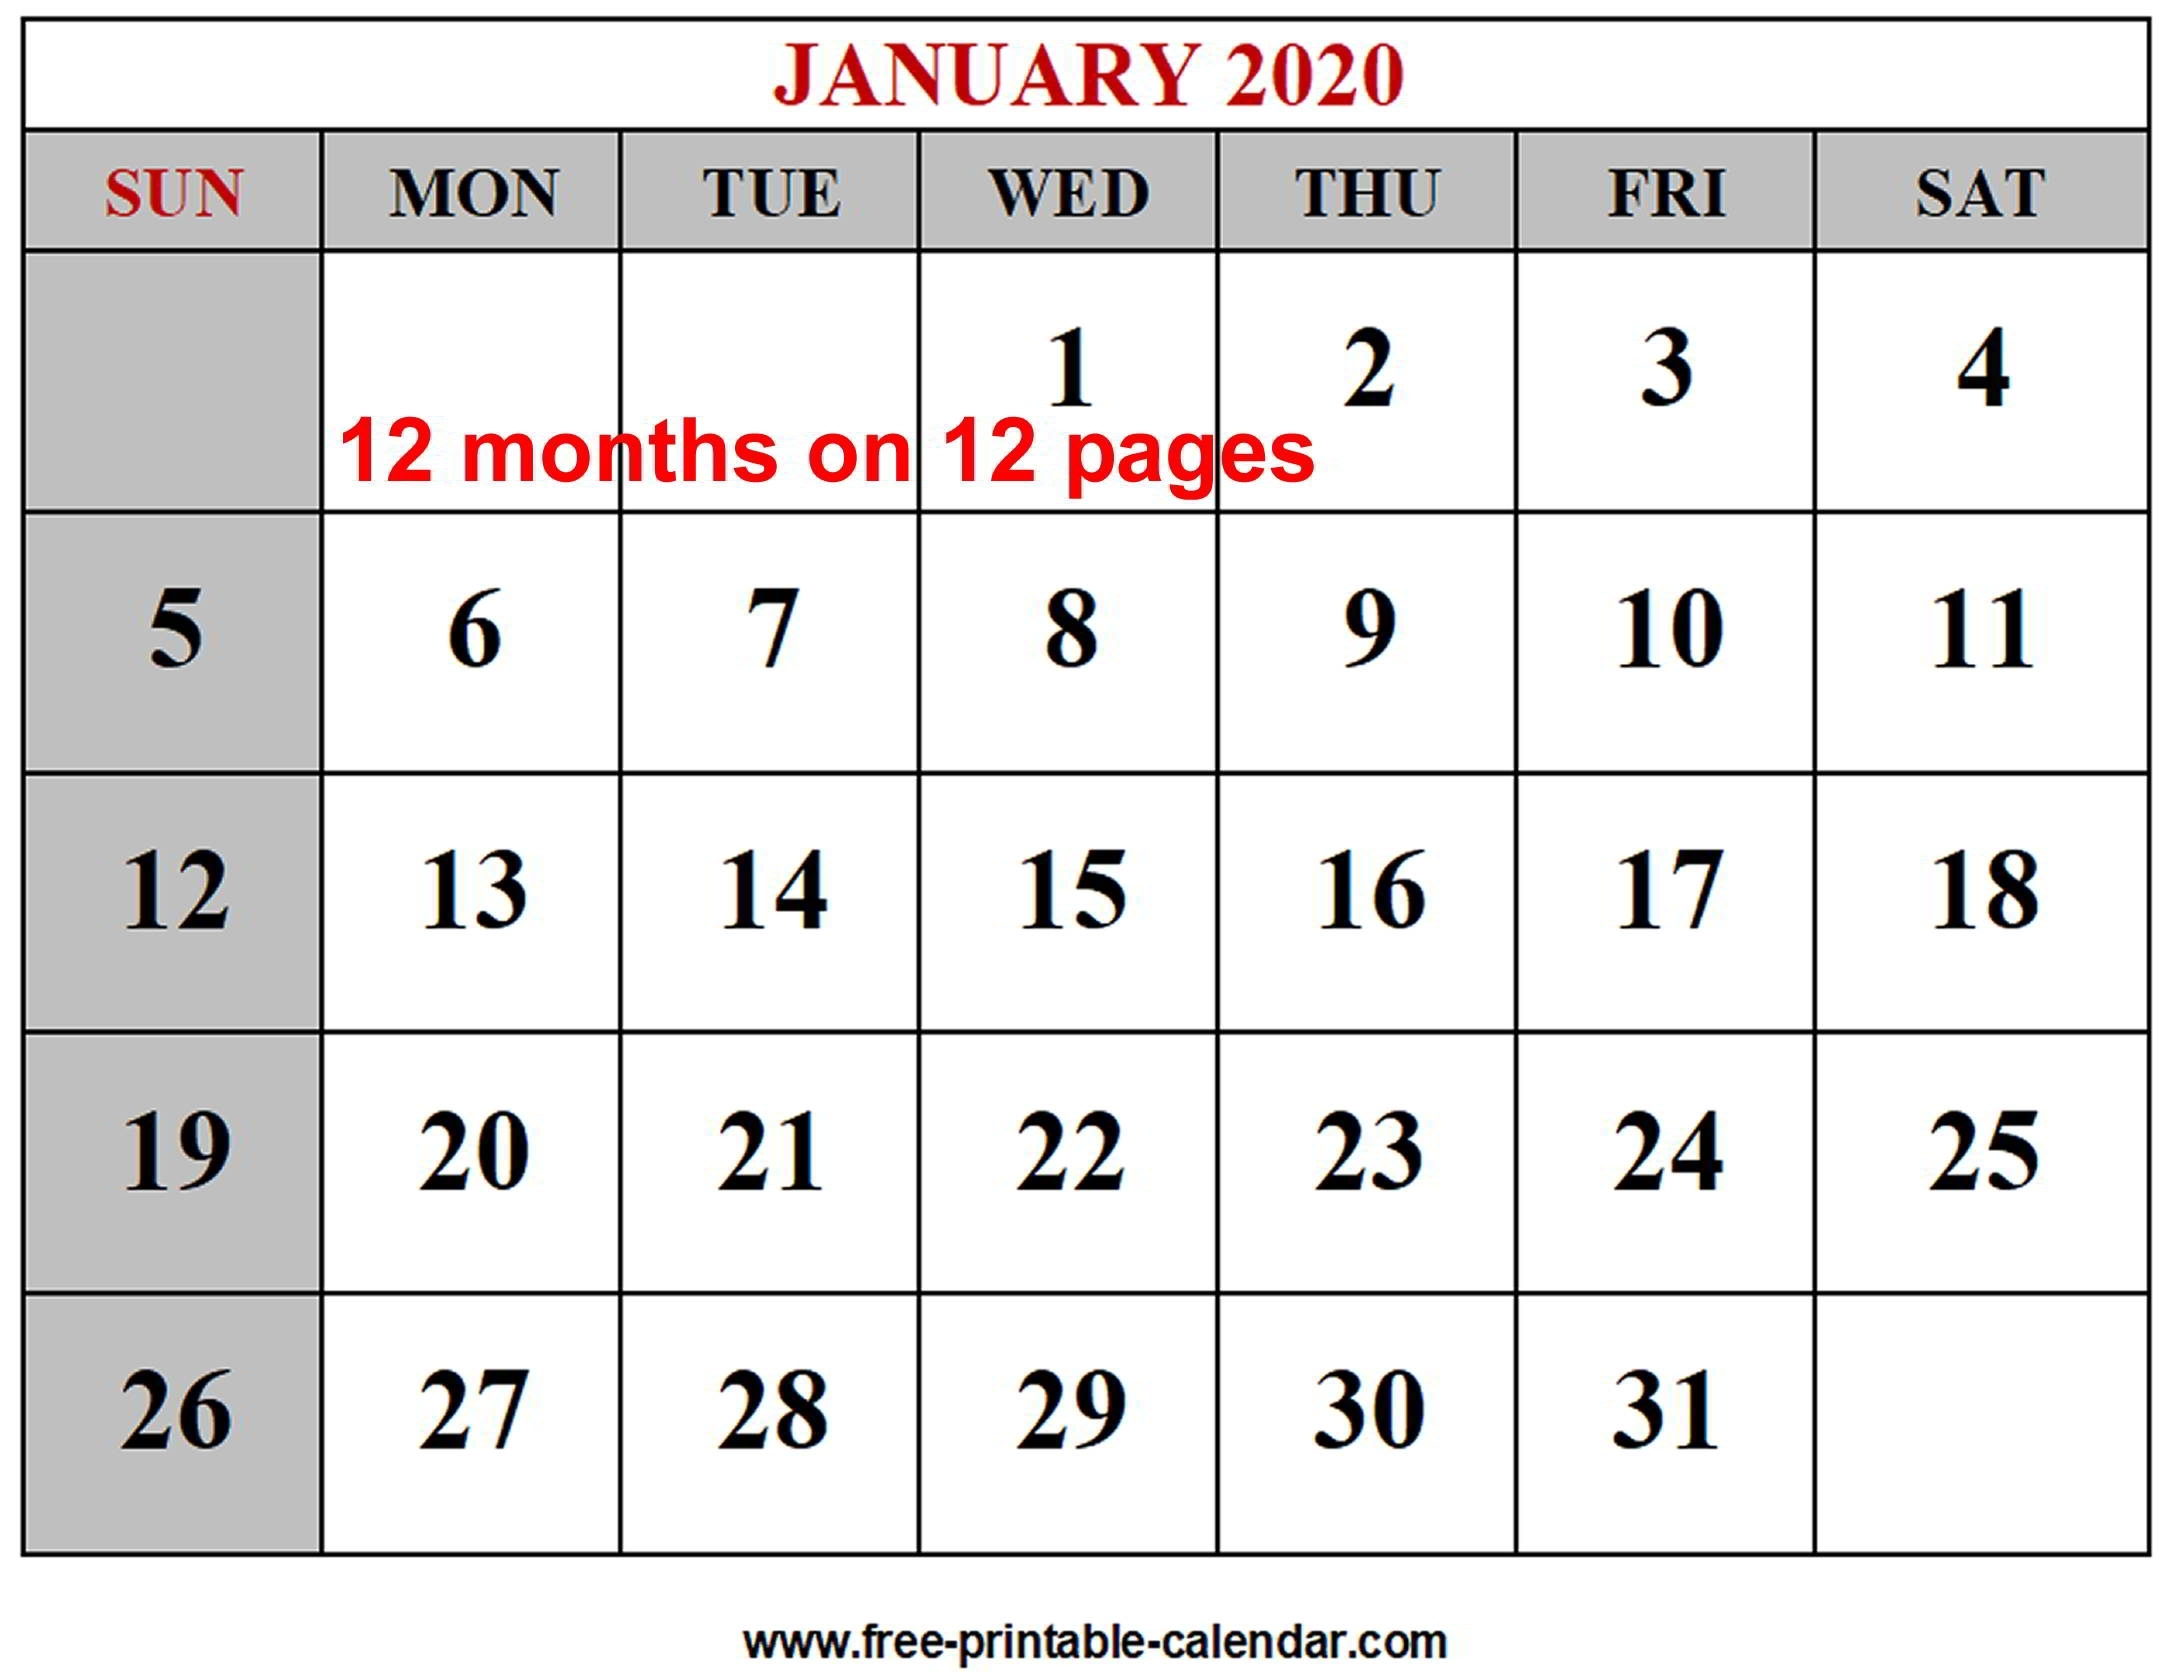 Year 2020 Calendar Templates - Free-Printable-Calendar pertaining to Printable Calendar 2020 Monthly Free